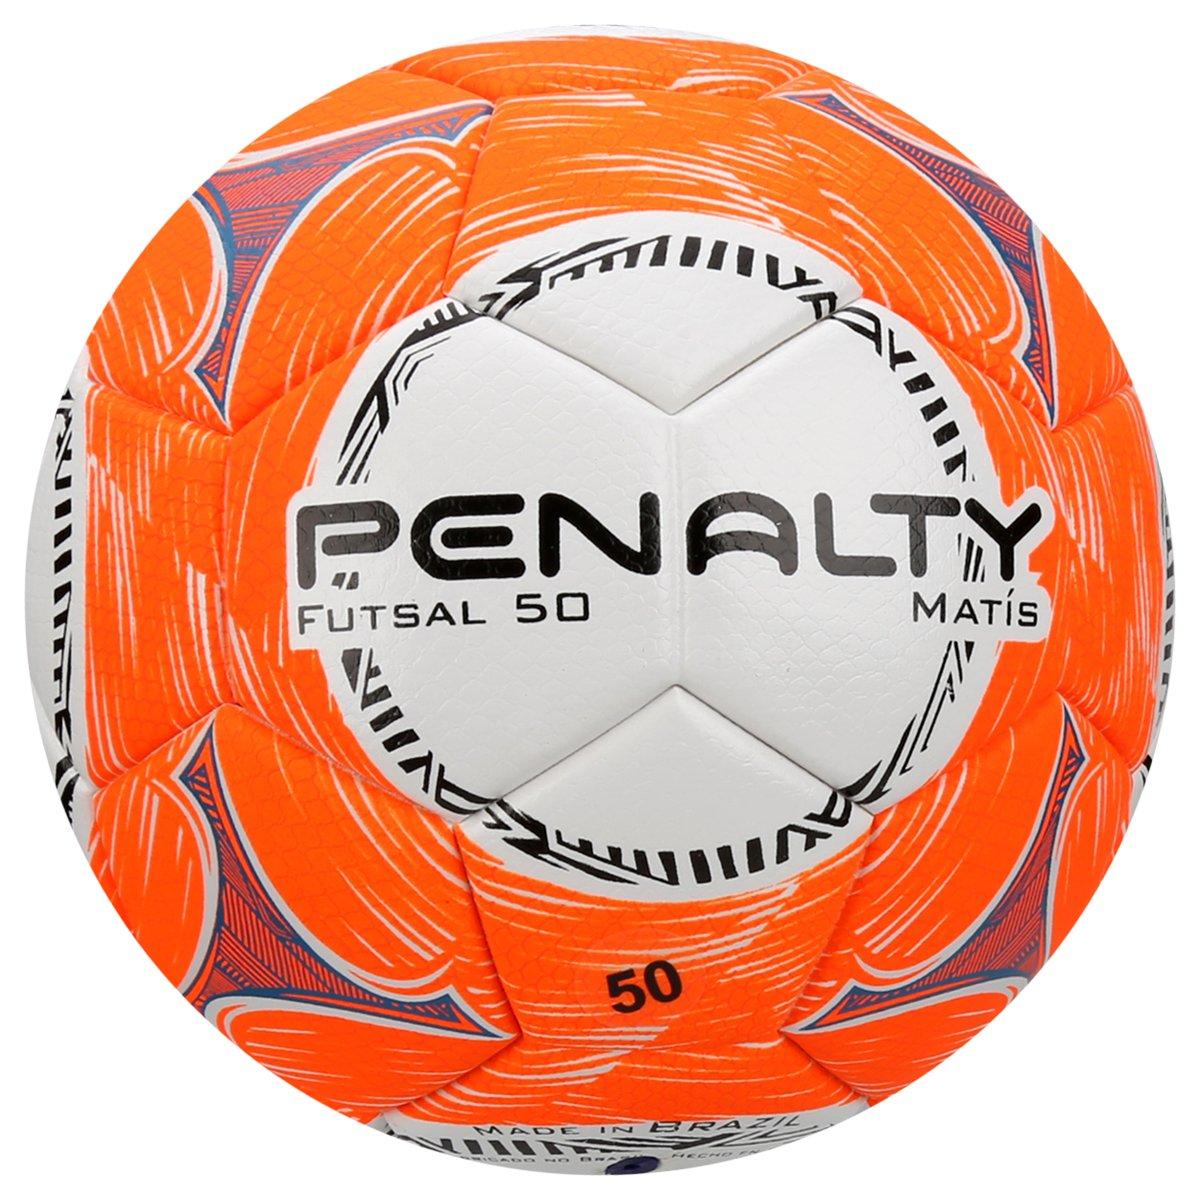 Minibola Futebol Penalty Matis 50 Futsal - Compre Agora  2f227163eb7ba